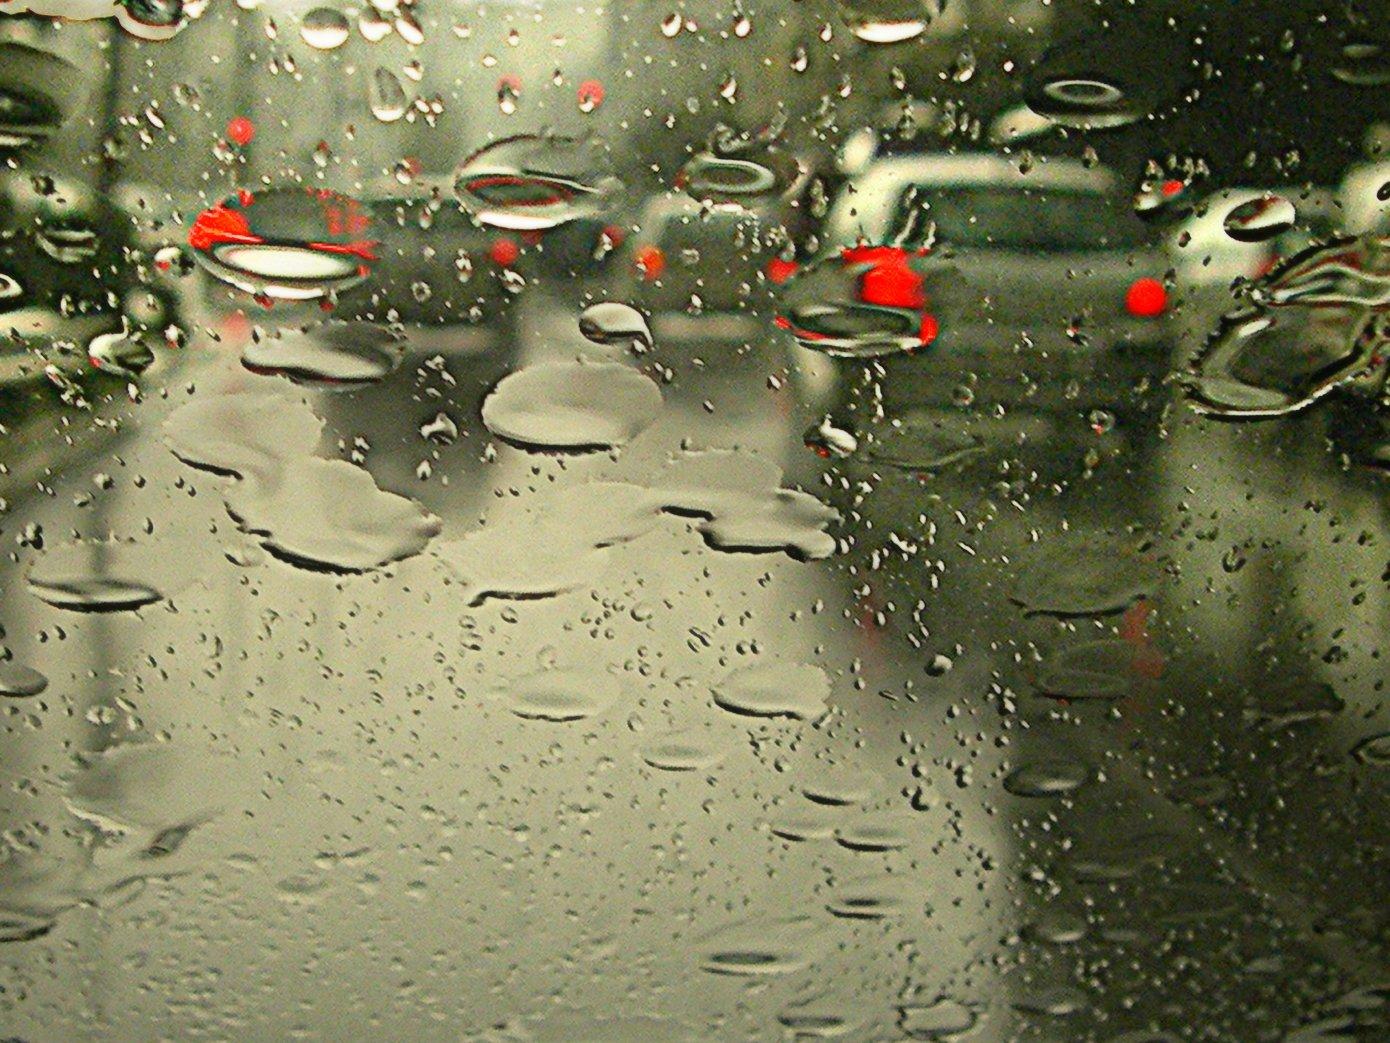 Os cuidados ao dirigir sob chuva